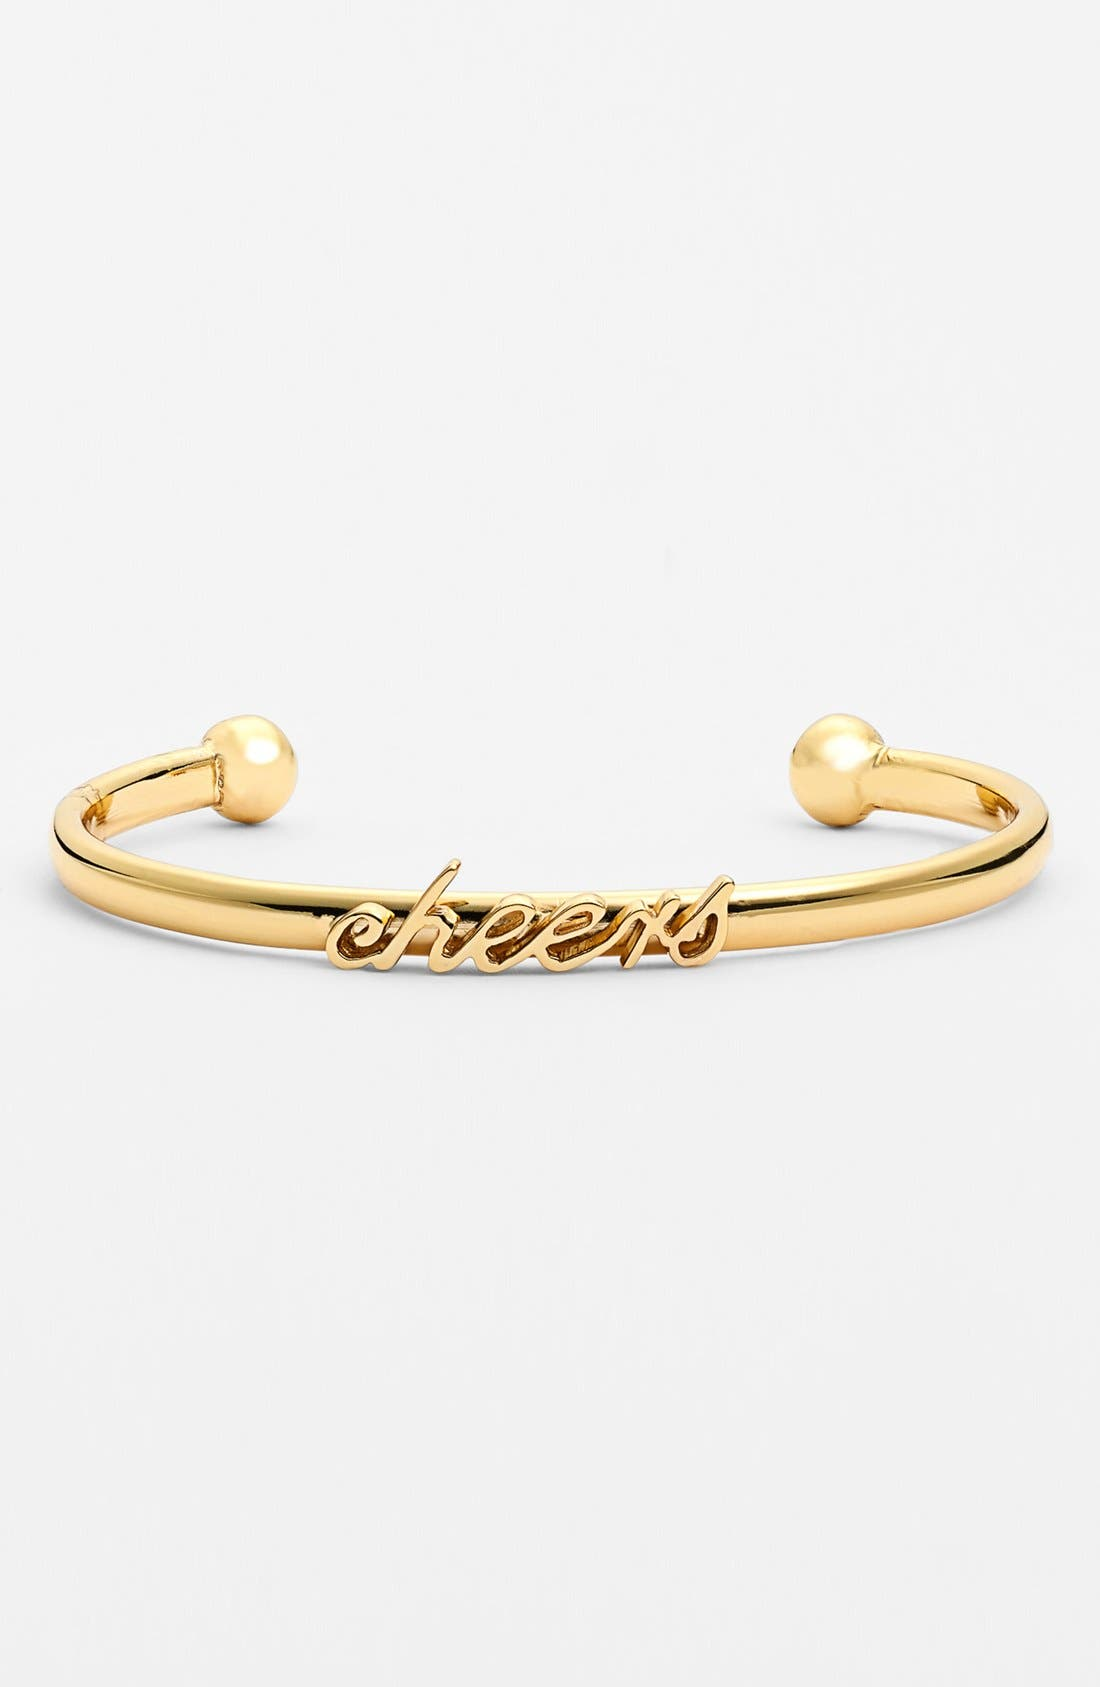 Alternate Image 1 Selected - kate spade new york 'cheers' script cuff bracelet